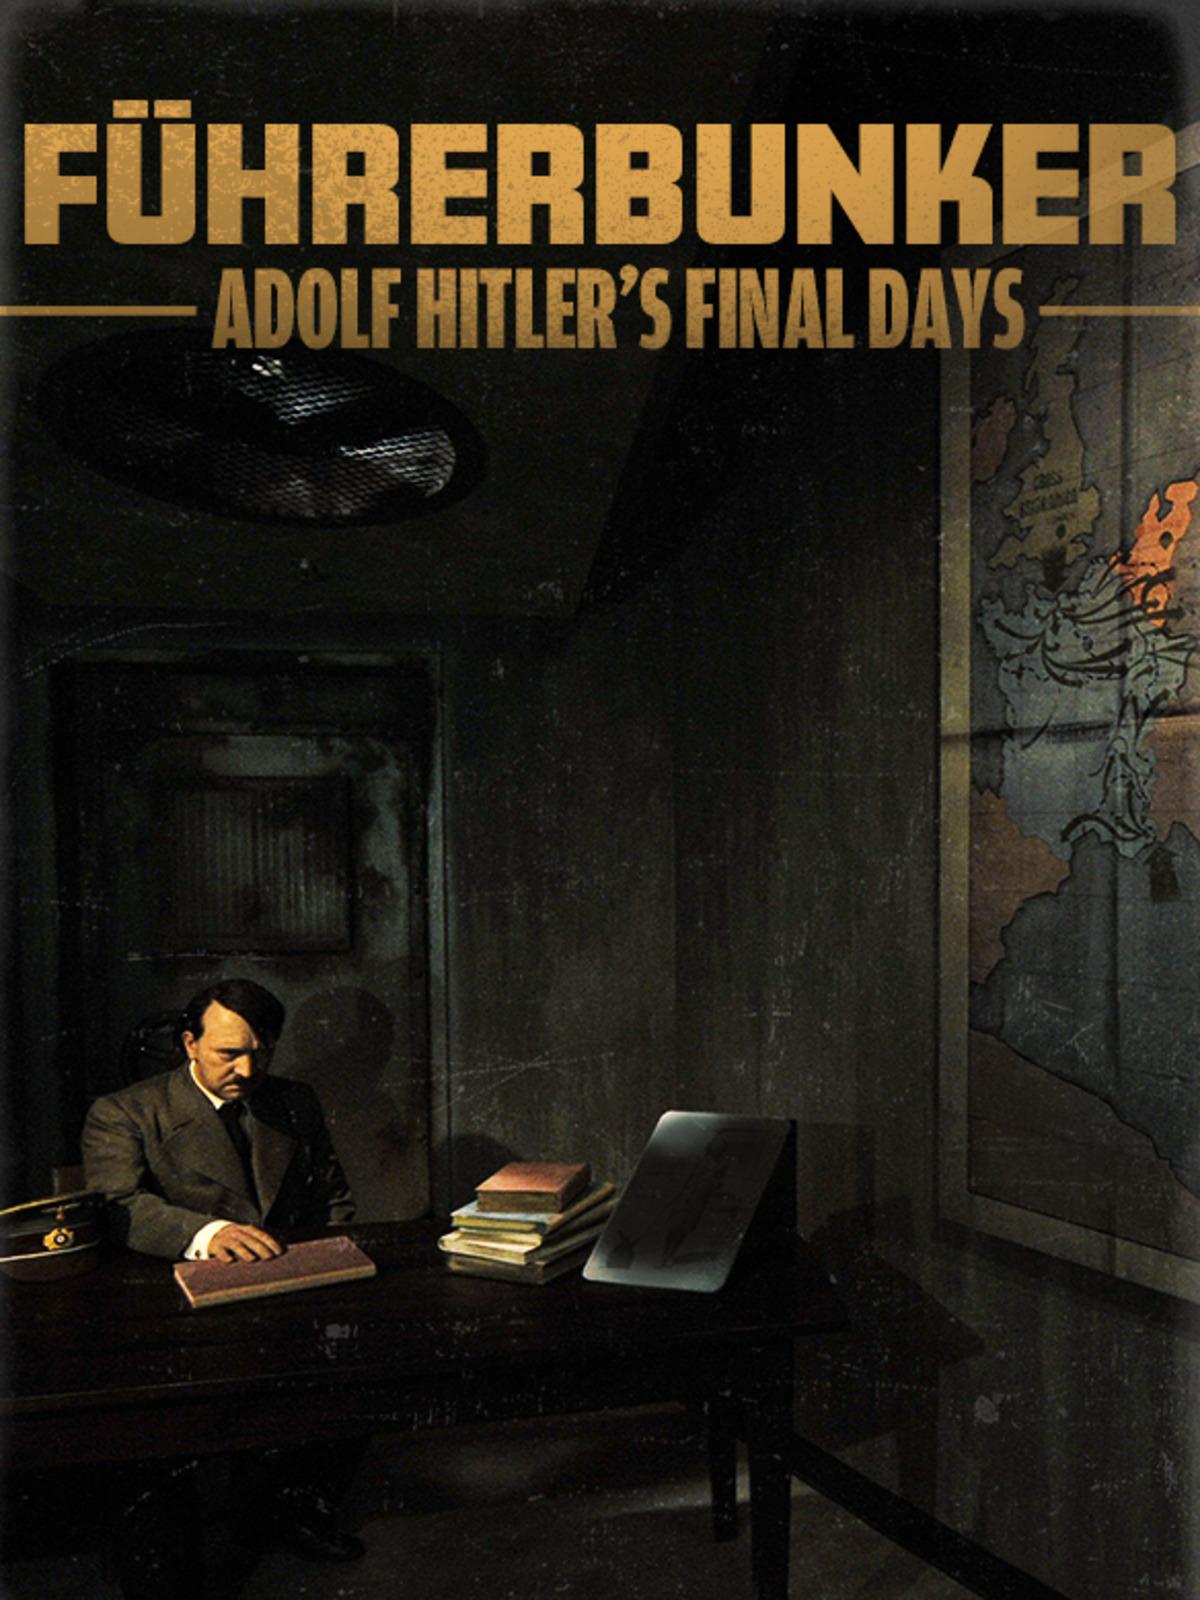 Führerbunker: Adolf Hitler's Final Days